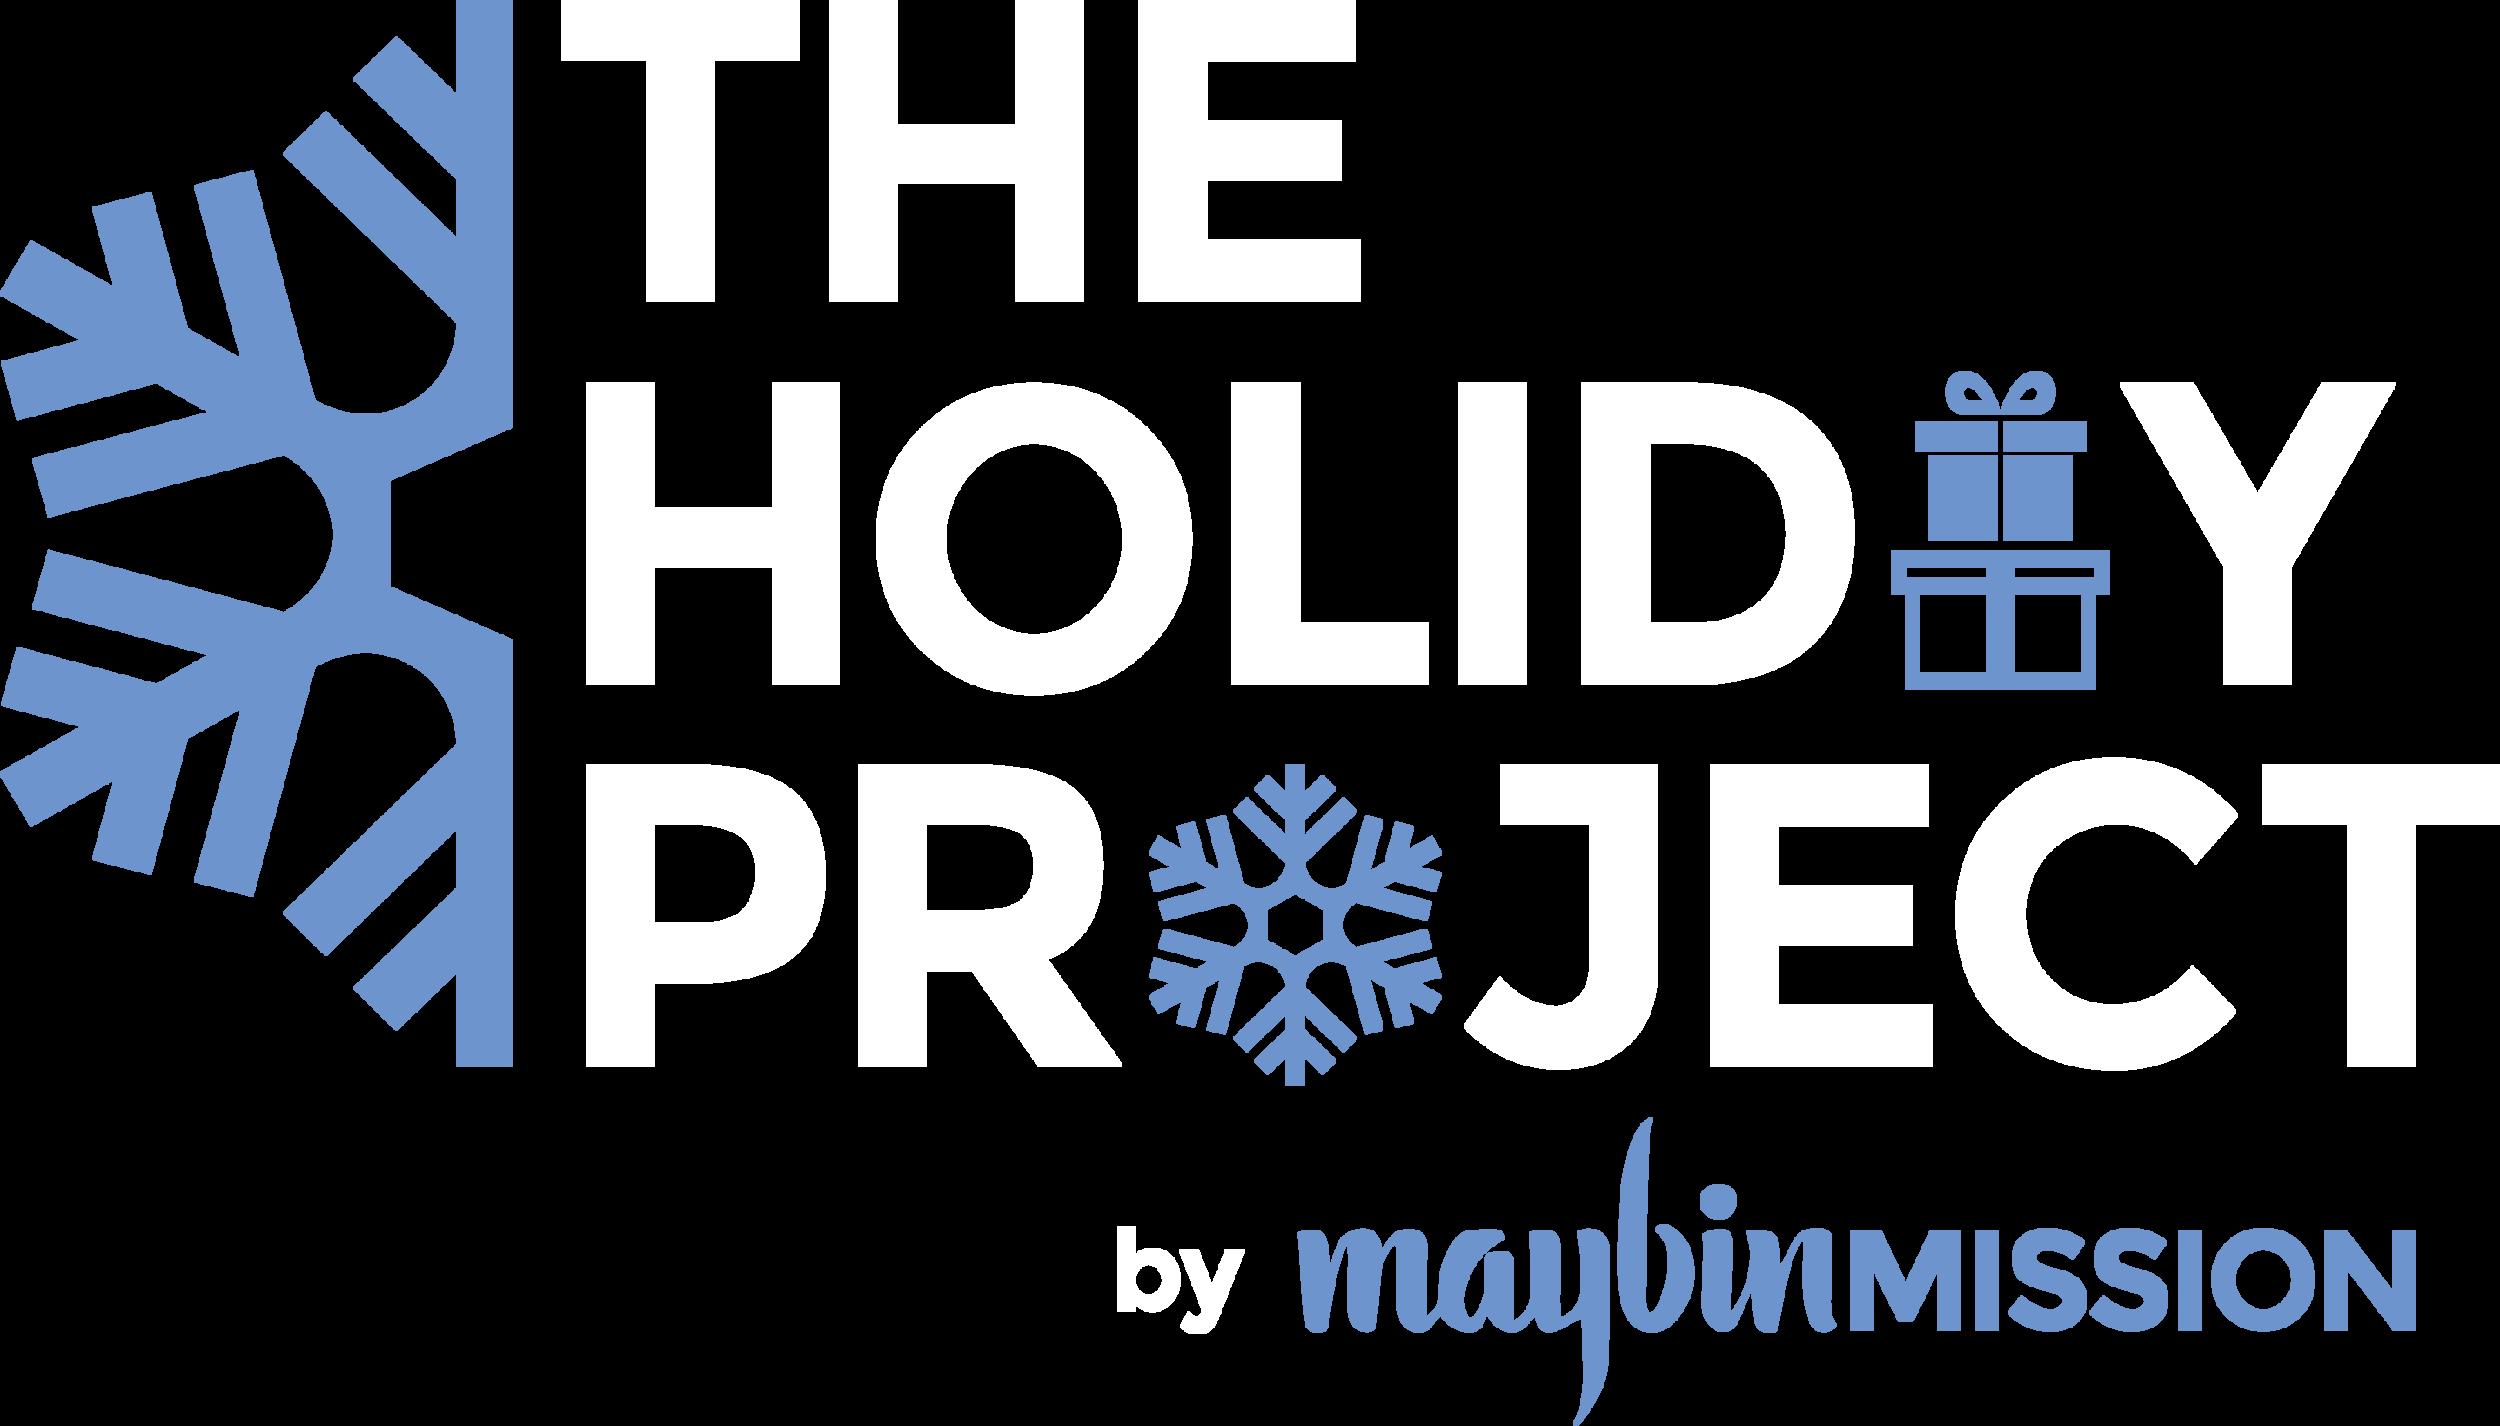 HolidayProject_lightondark.png